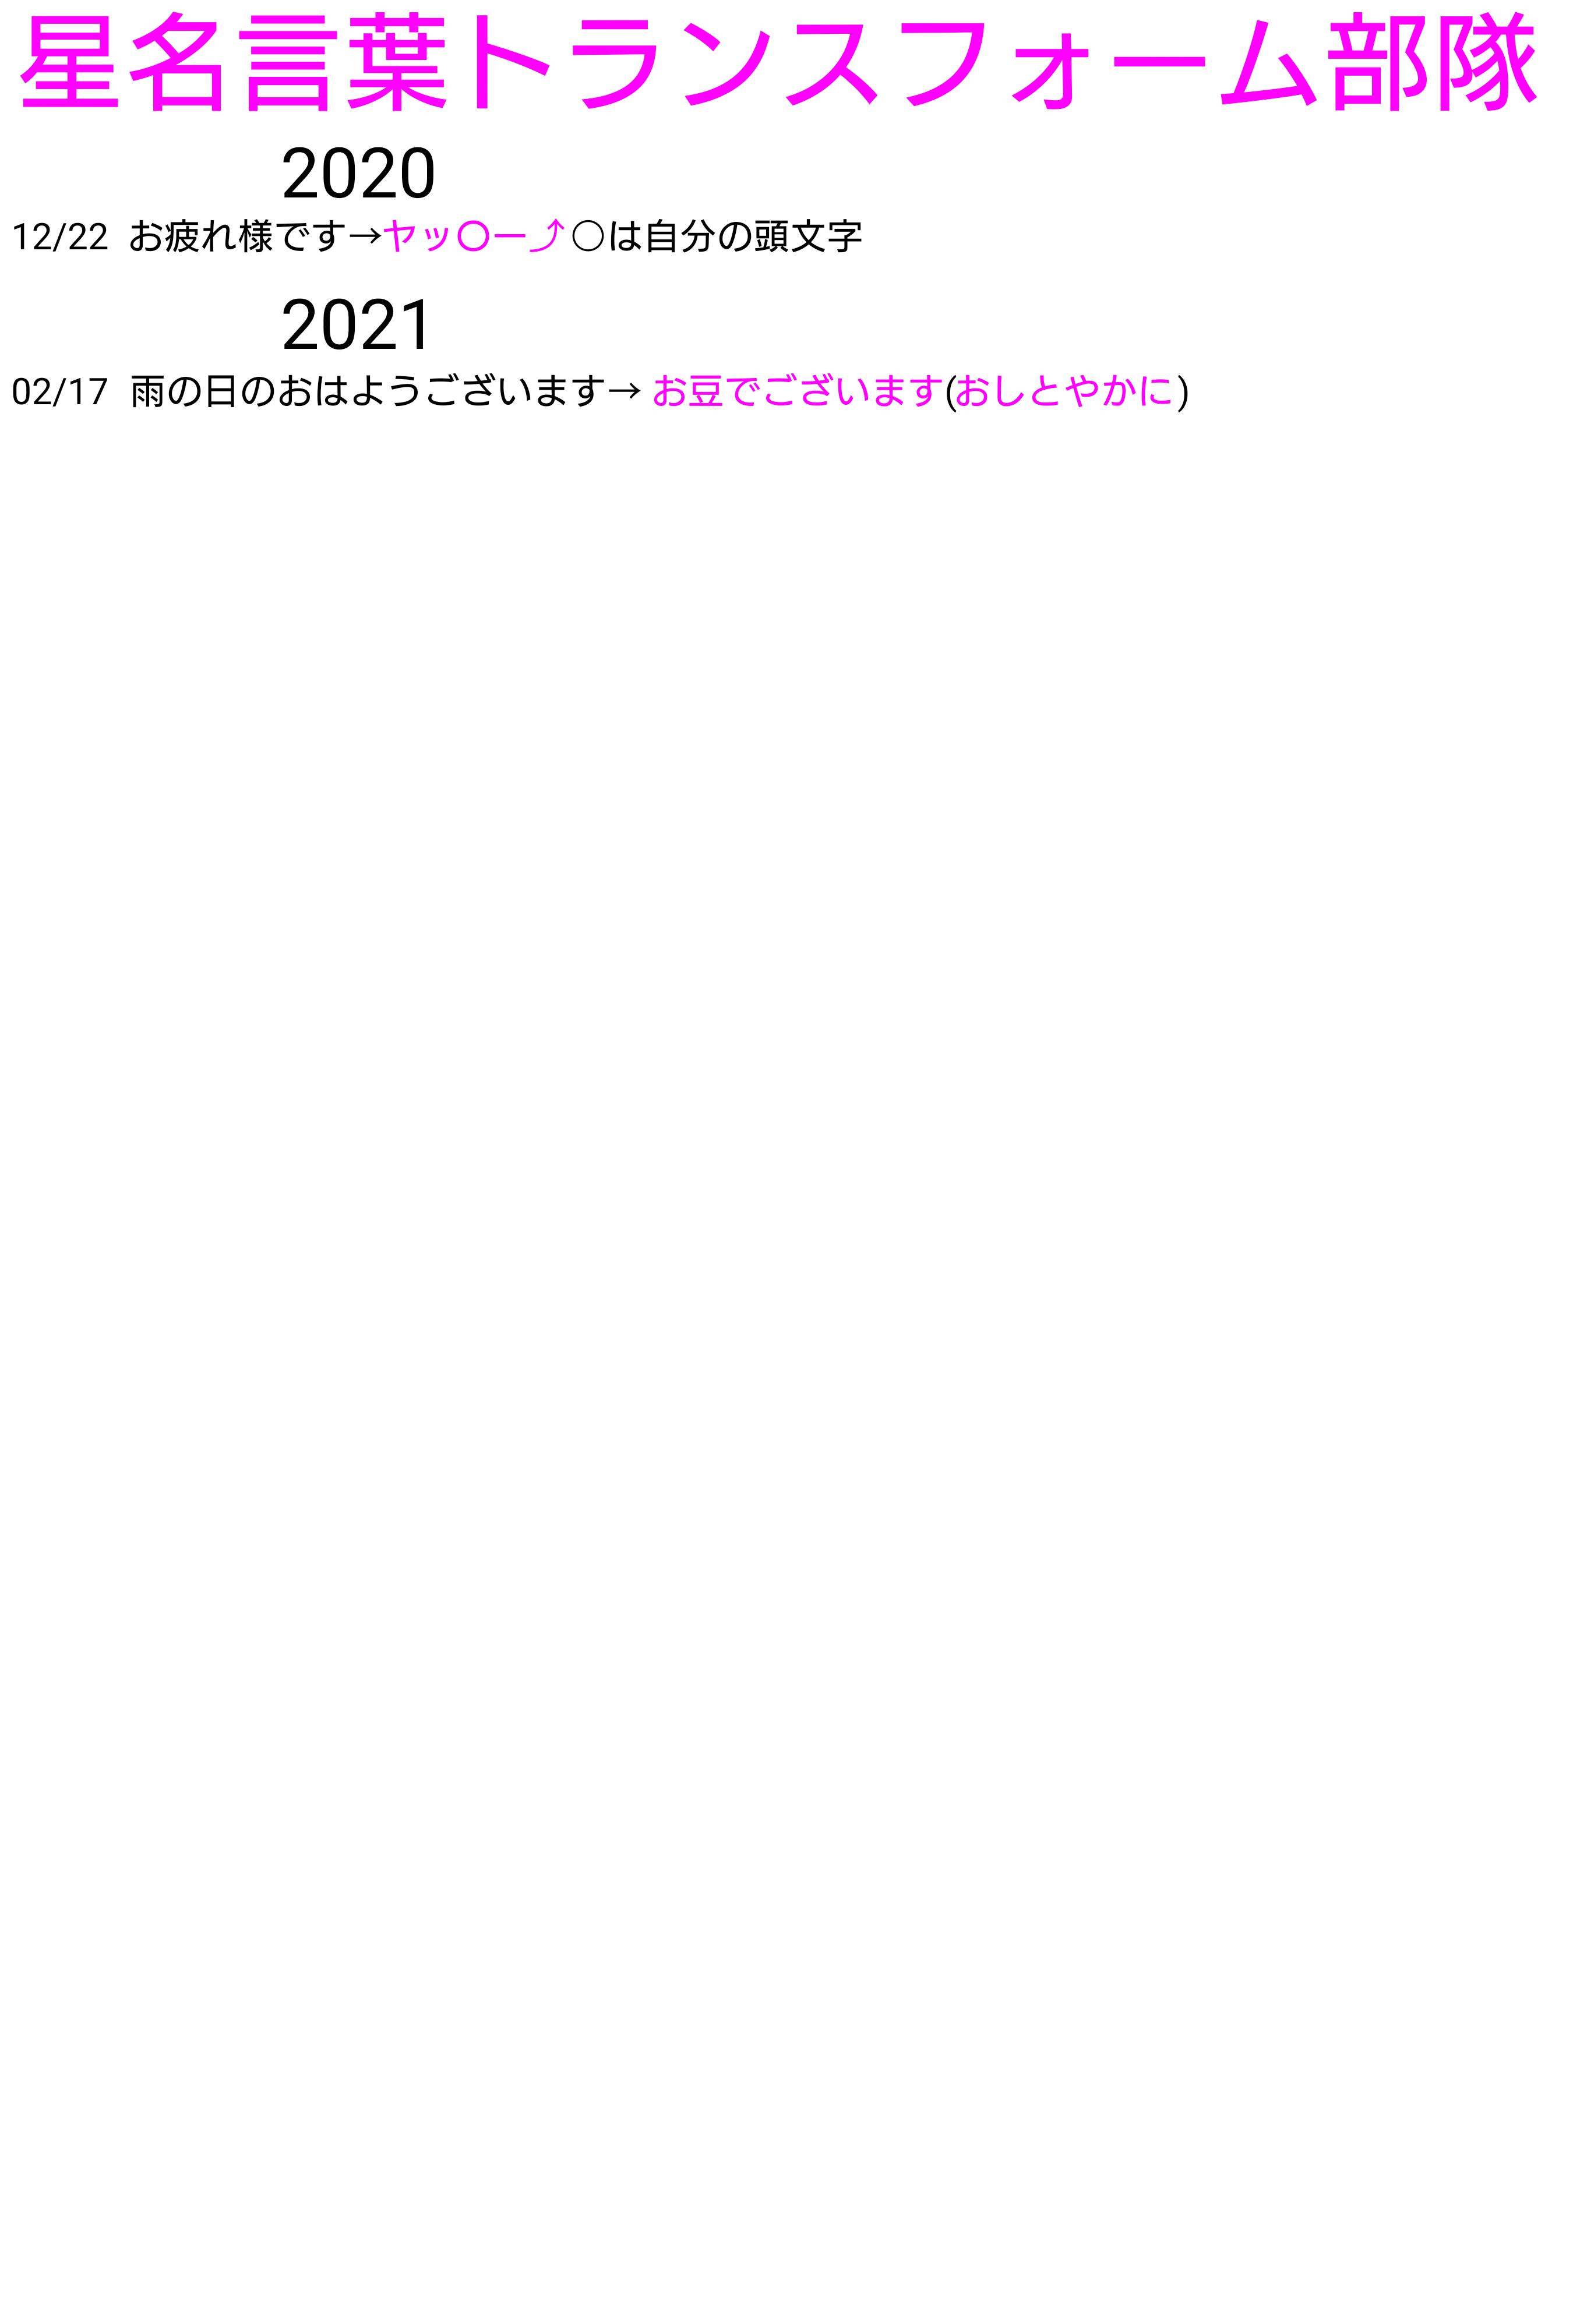 f:id:nanana8ebi:20210217213425p:plain